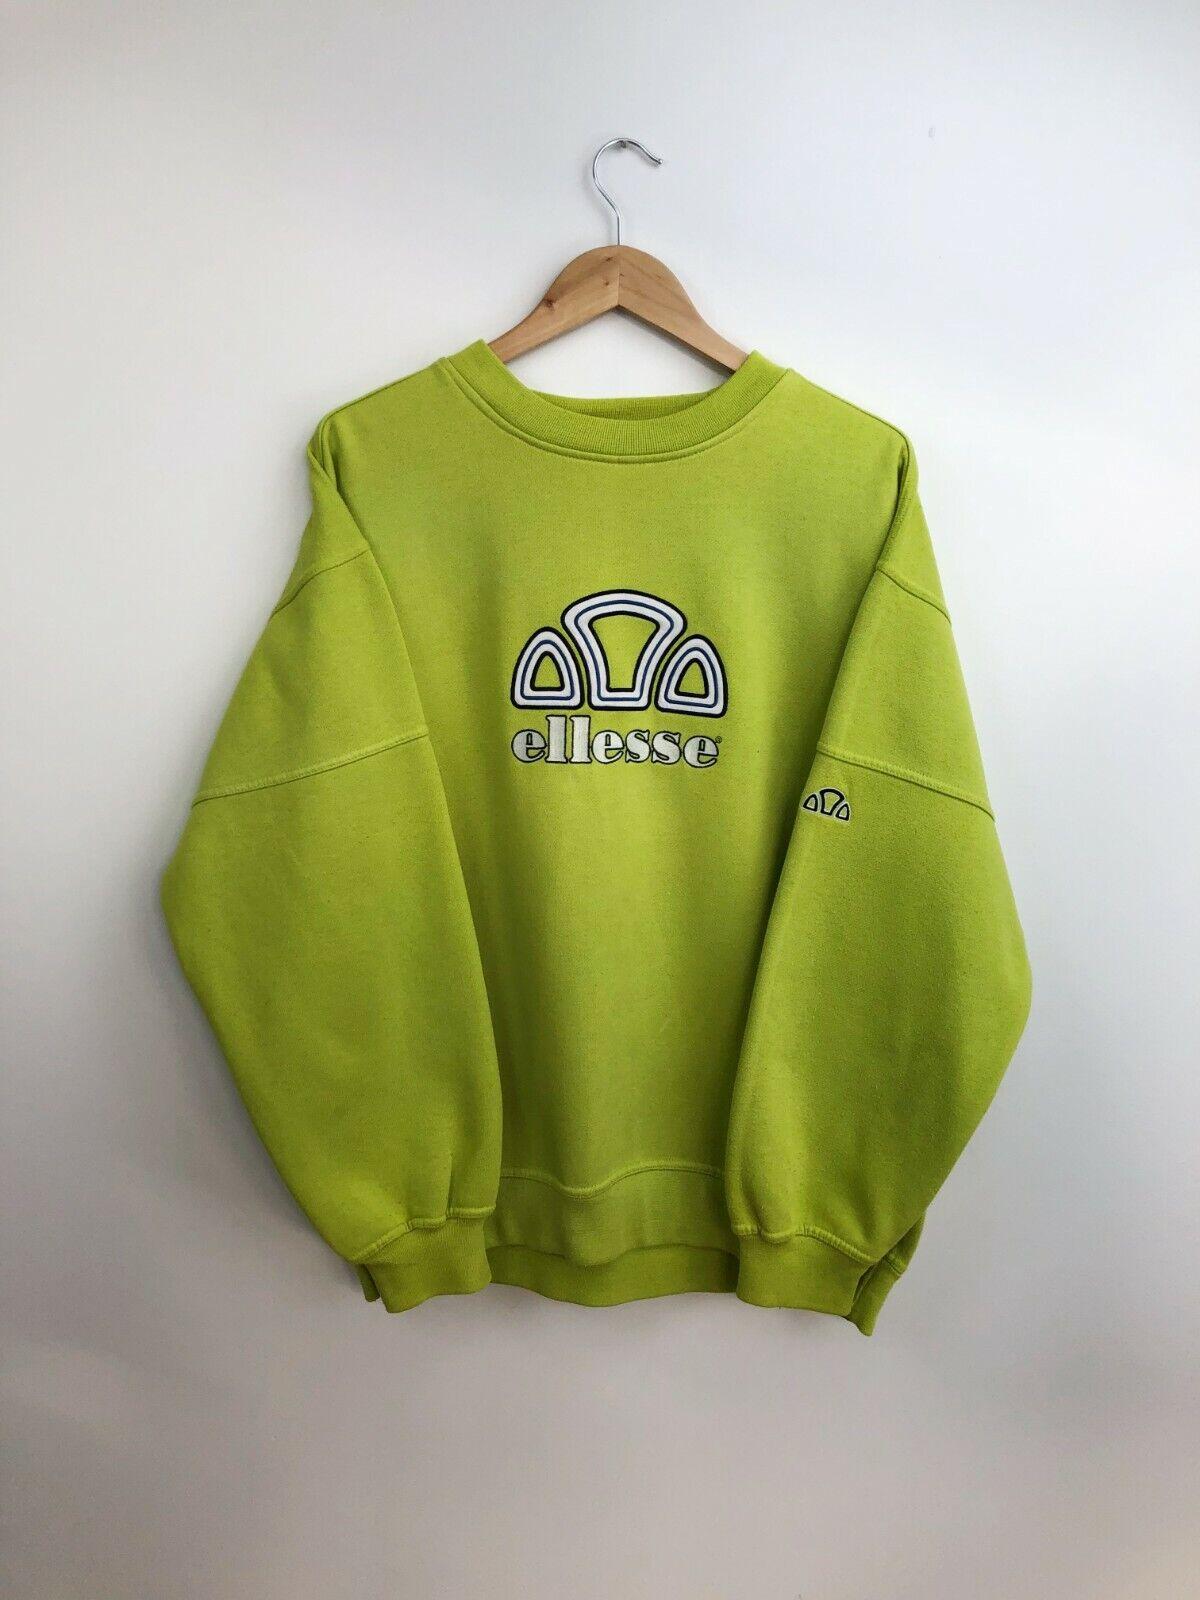 Vintage 90s Ellesse Crew Neck Embroidered Logo Sweatshirt Green Mens M - L